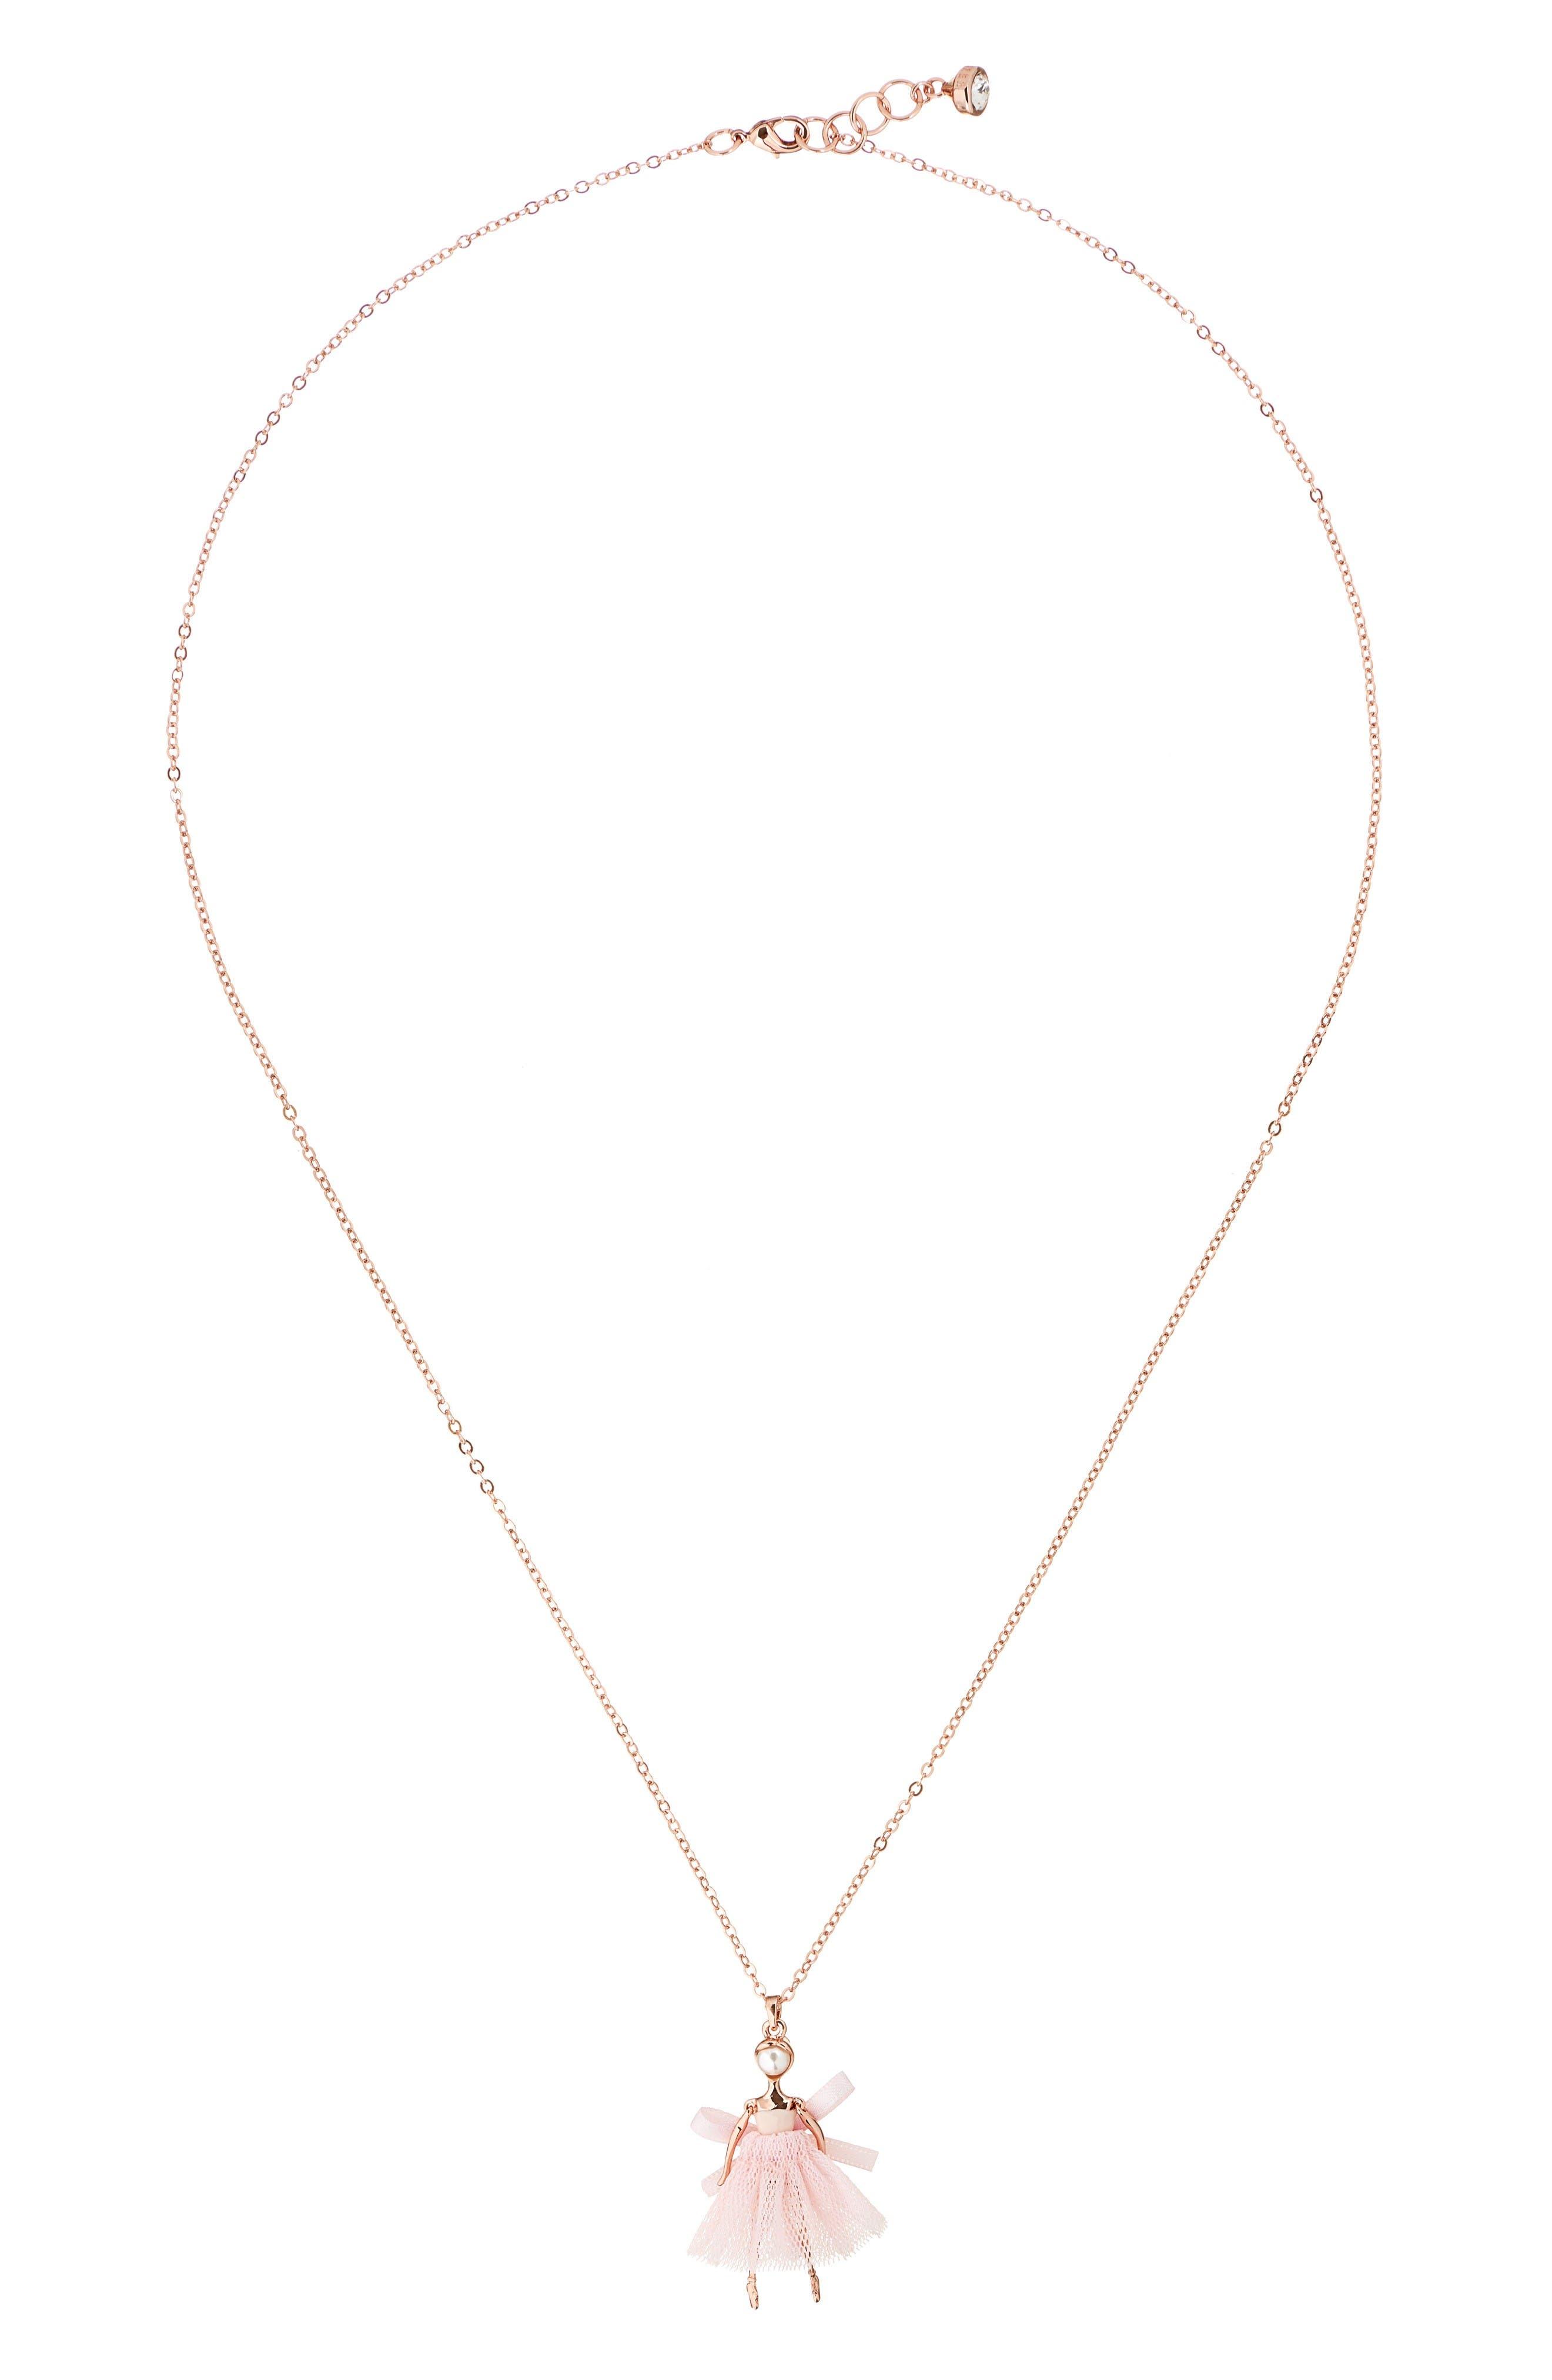 Carabel Ballerina Pendant Necklace,                             Main thumbnail 1, color,                             Nude Pink